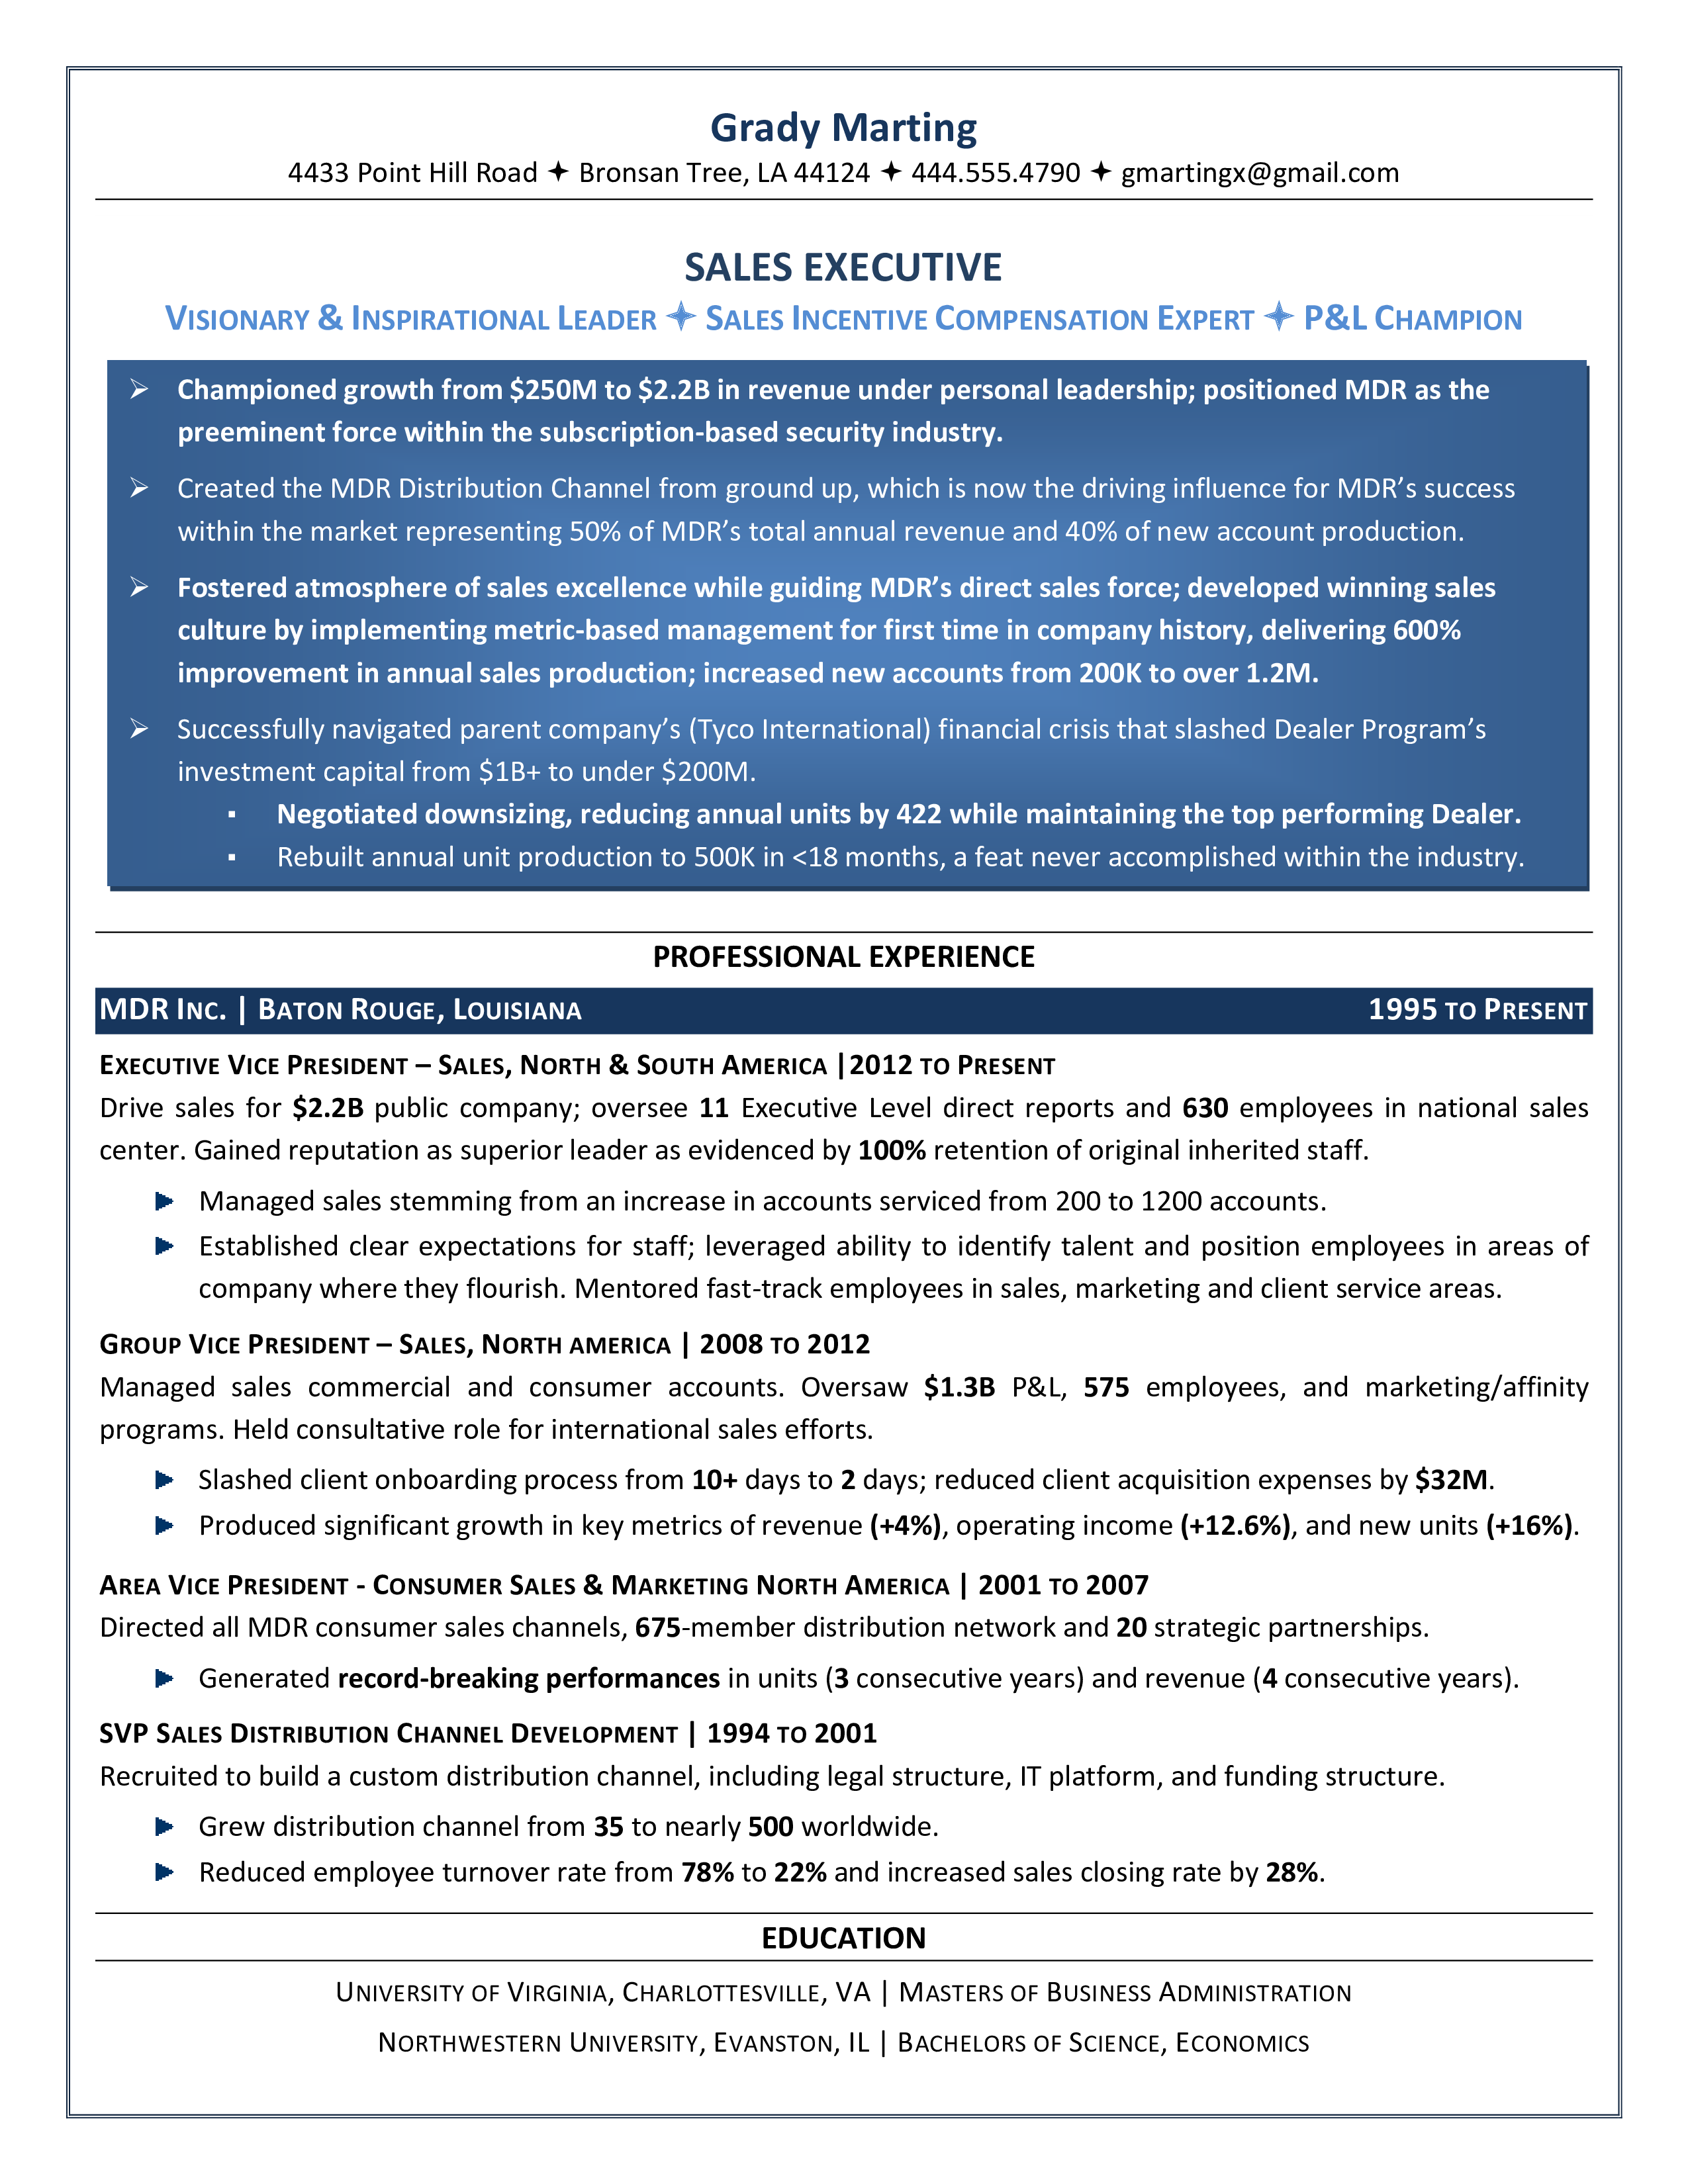 Free Sales Executive Job Resume | Templates at allbusinesstemplates.com